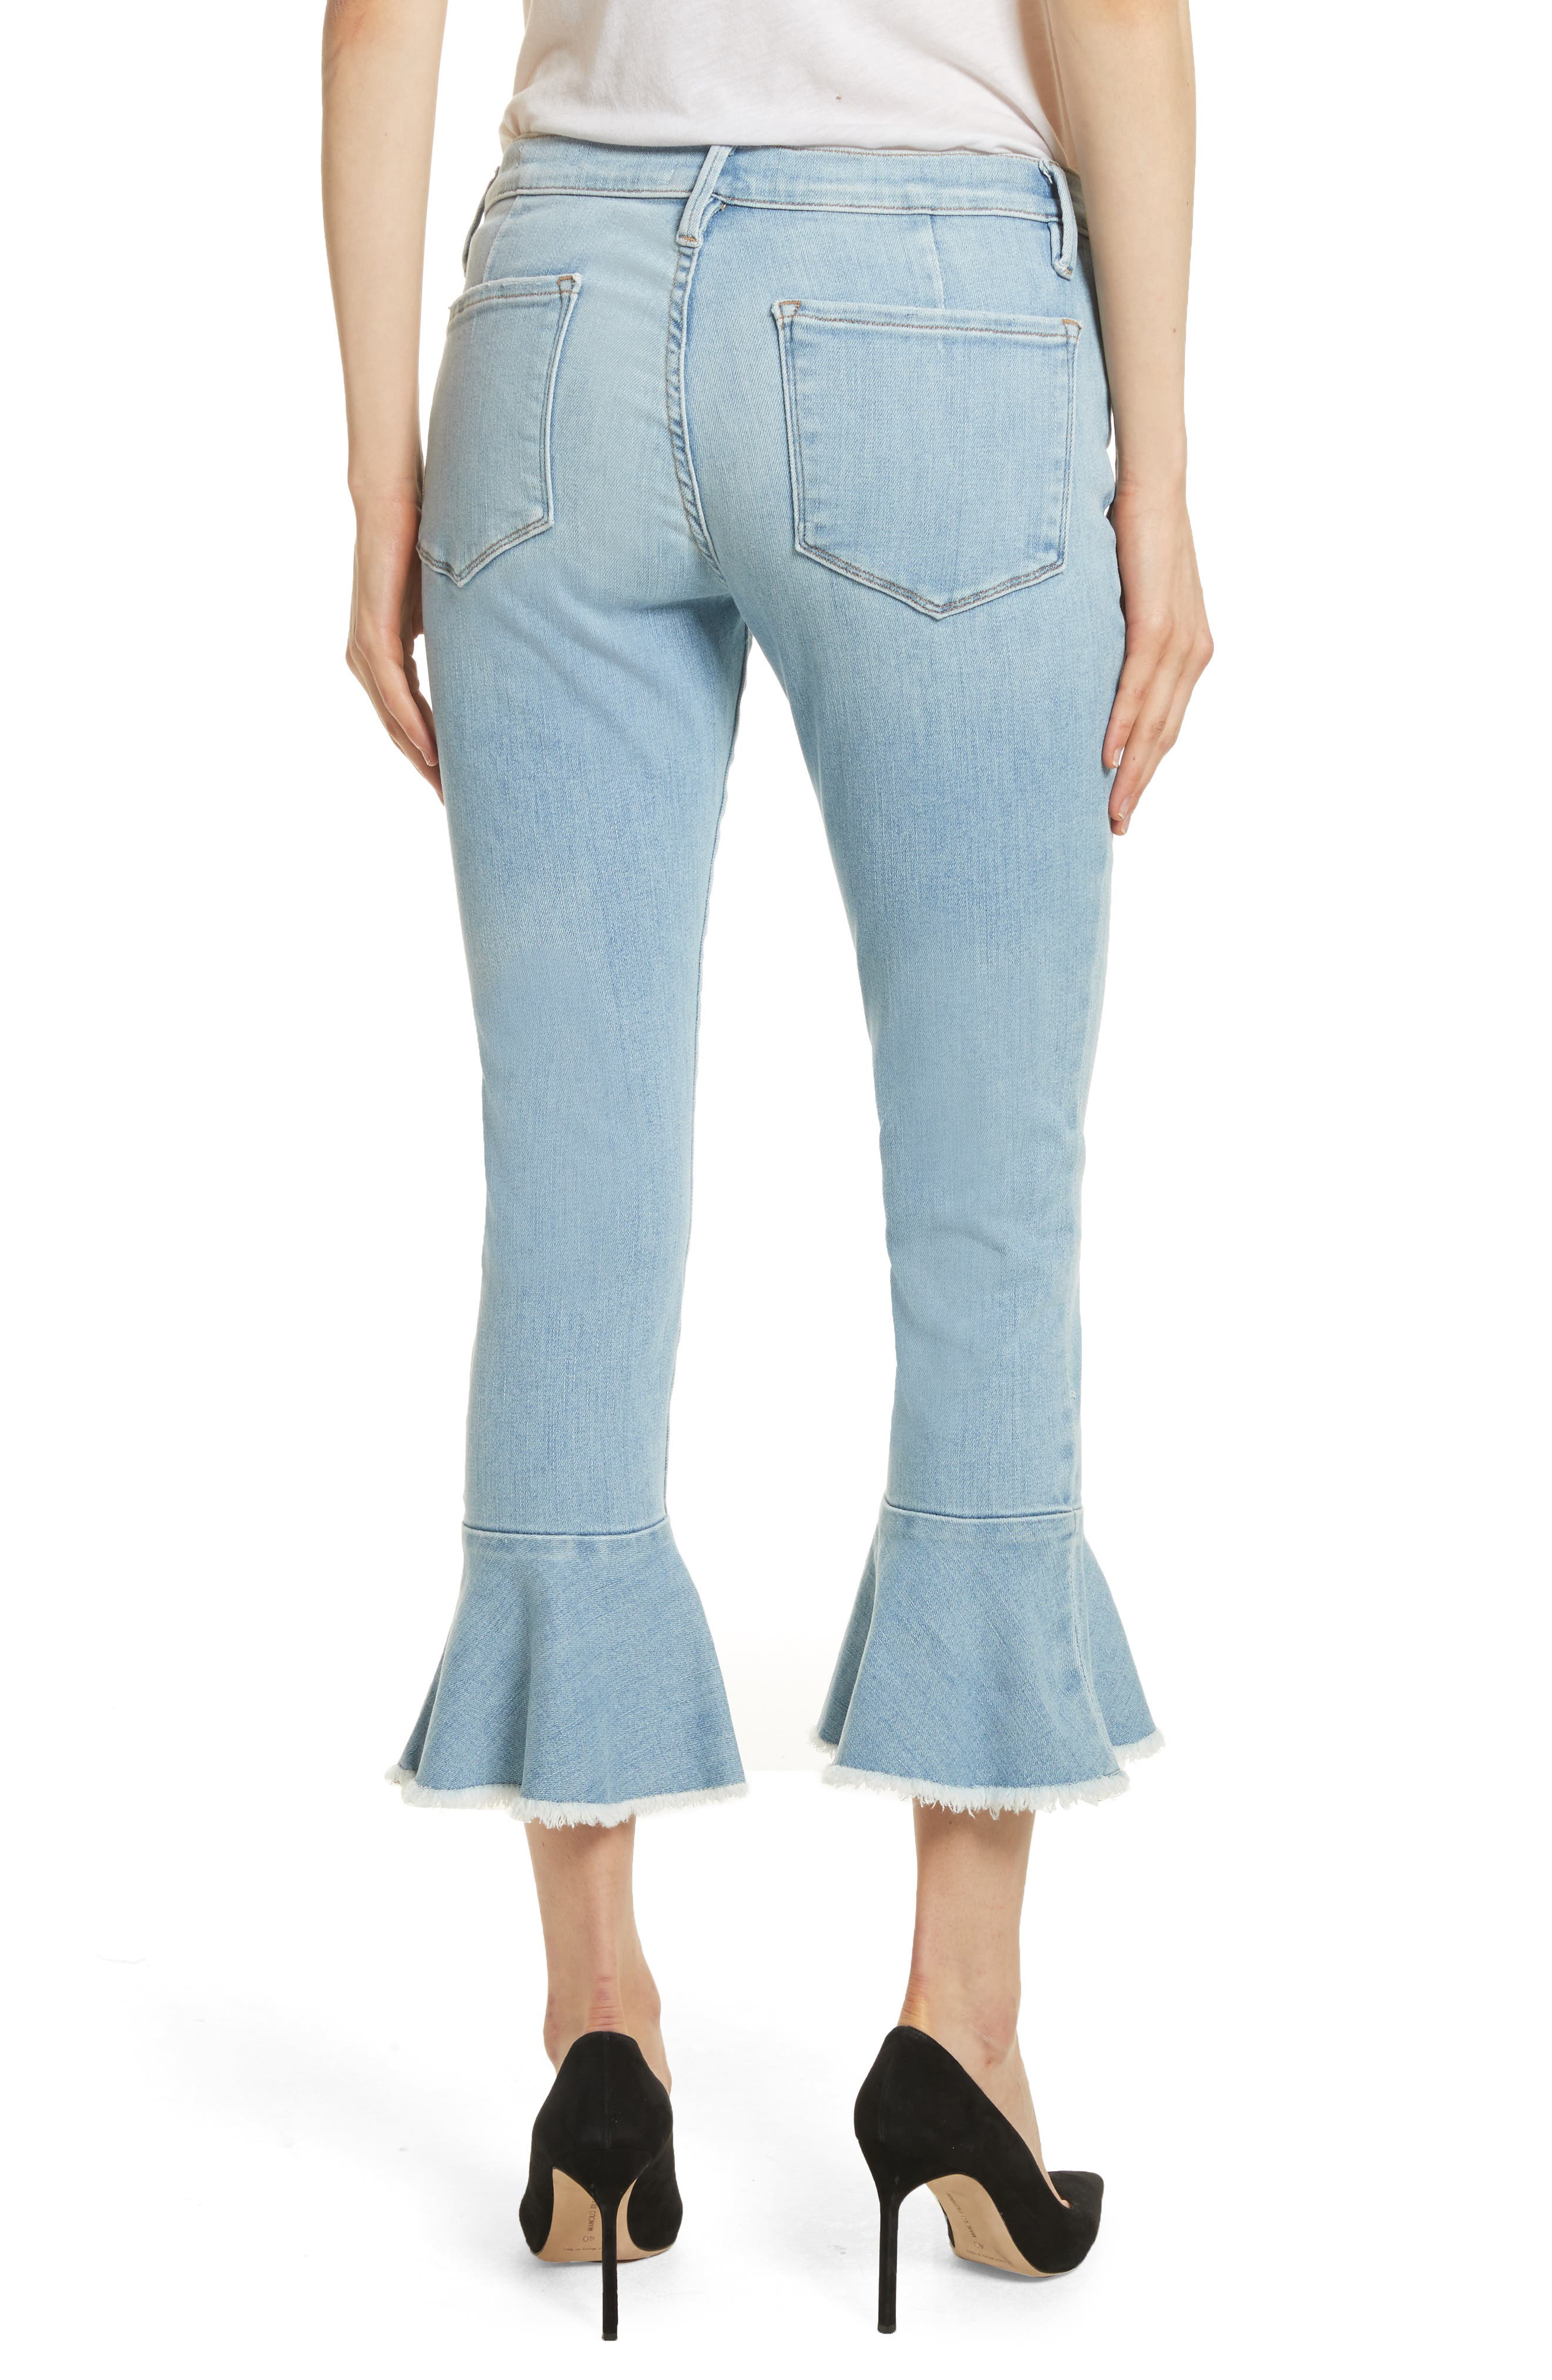 Le Skinny de Jeanne Flounce Skinny Jeans,                             Alternate thumbnail 2, color,                             Limer Stone